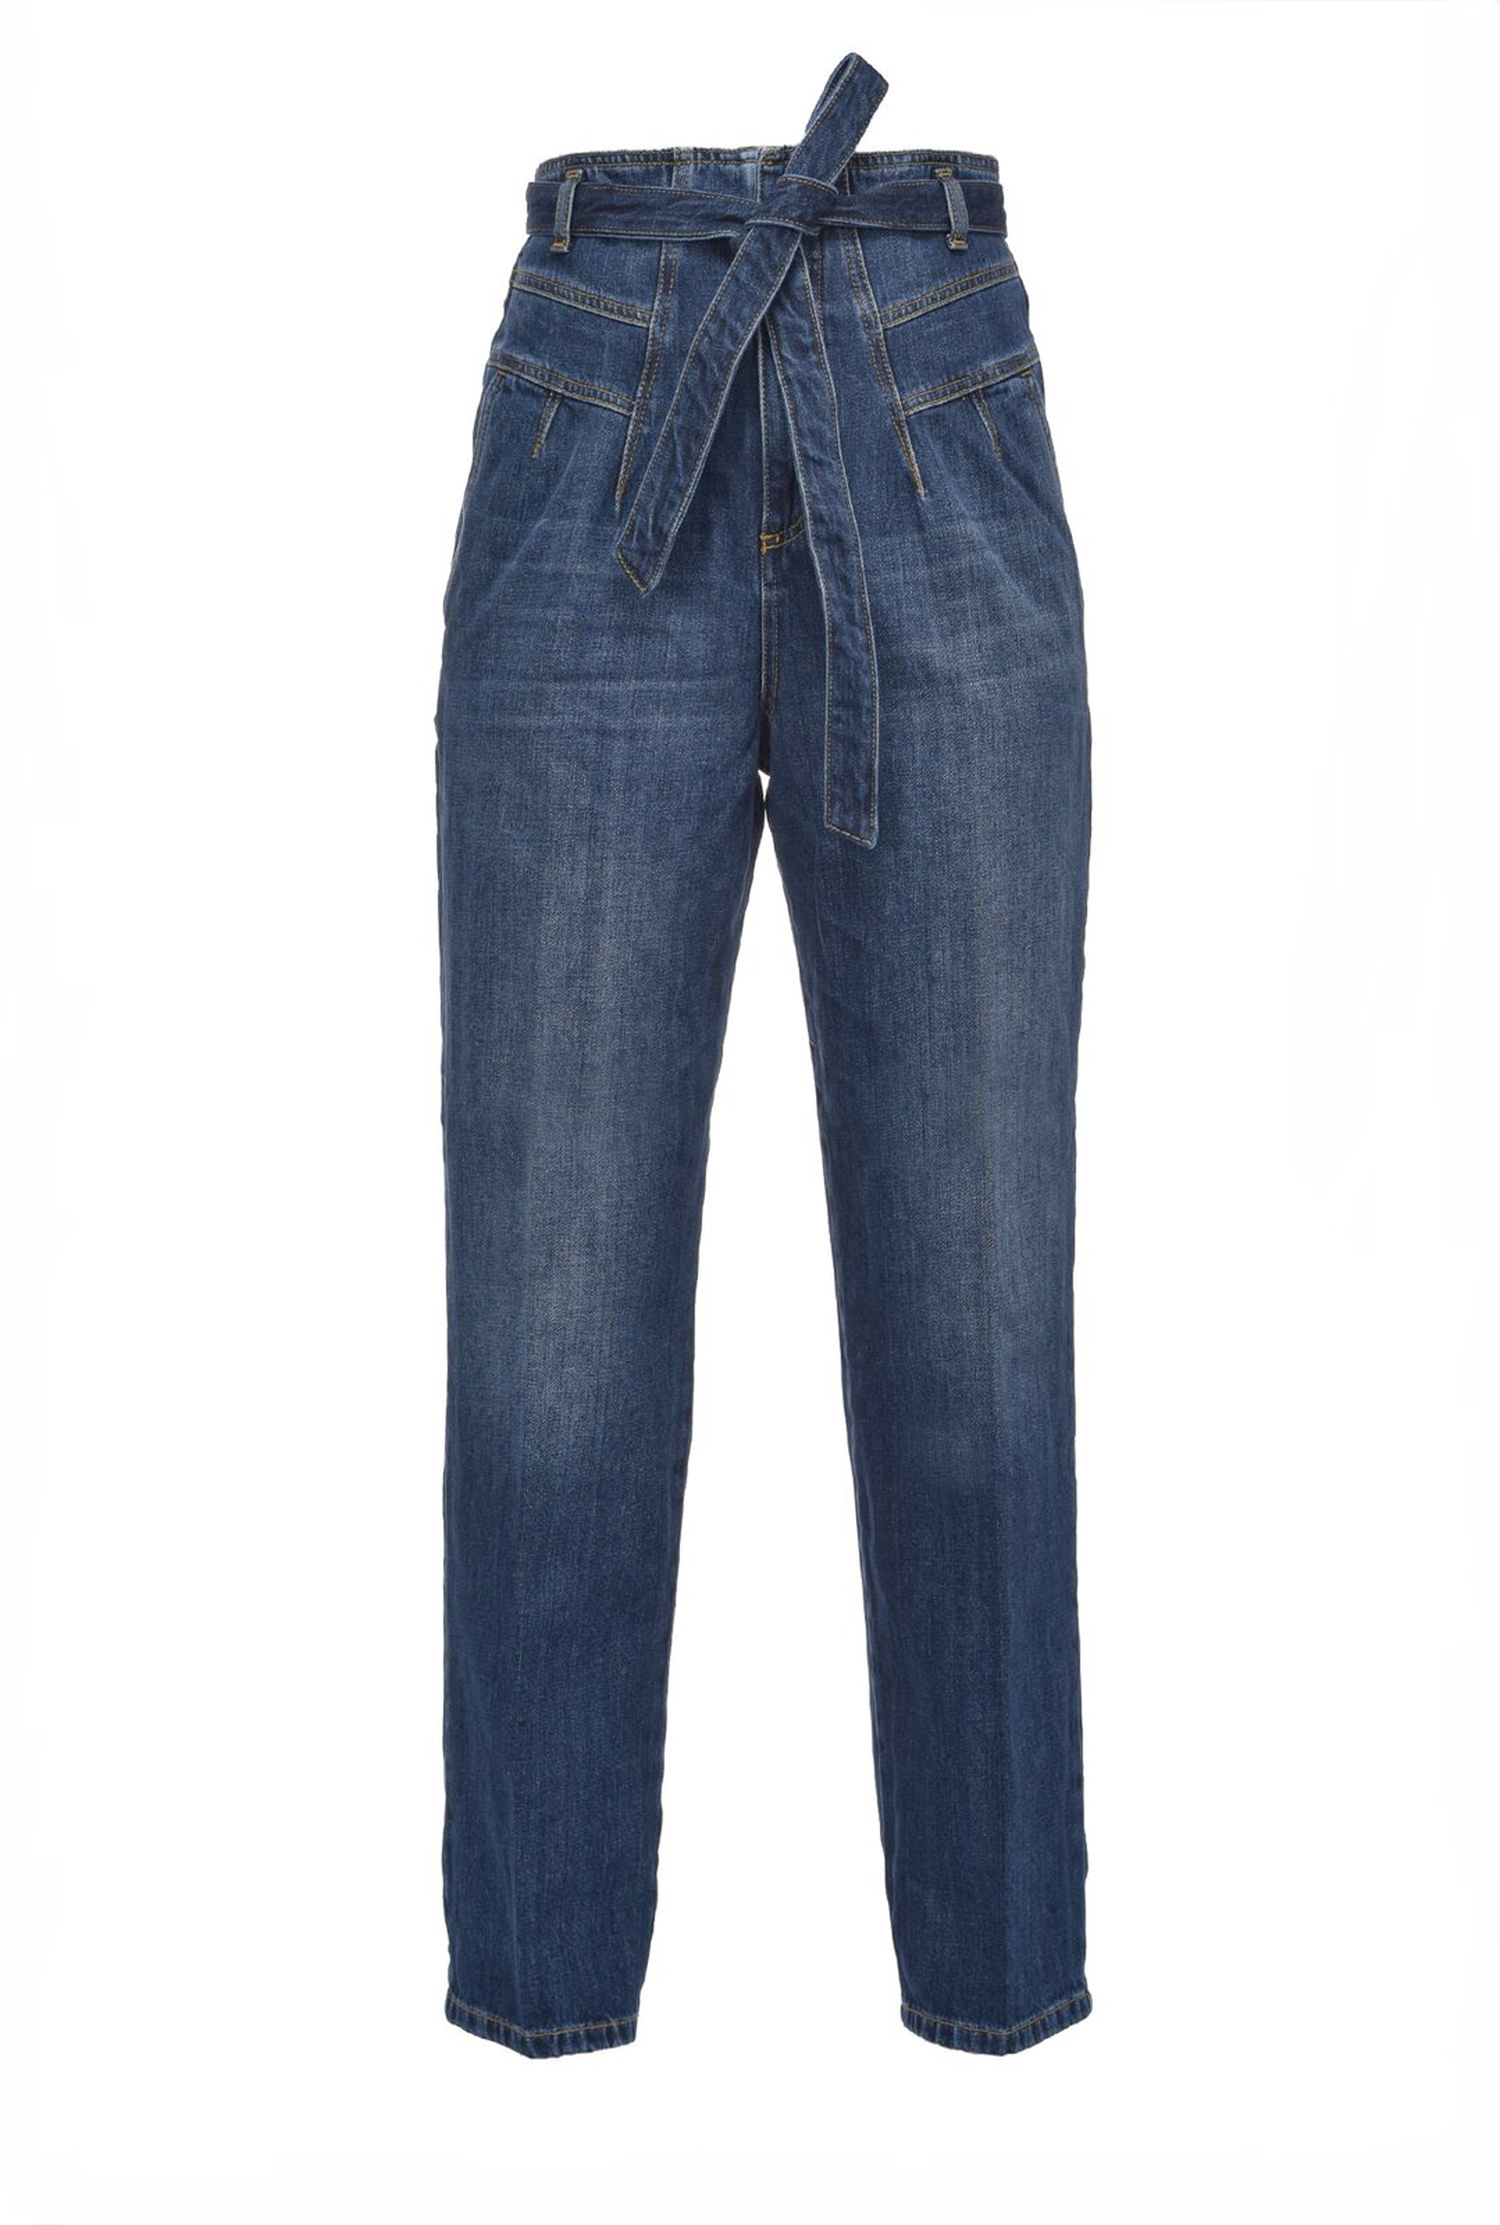 Jeans Carrot-Fit In Denim Vintage - Pinko